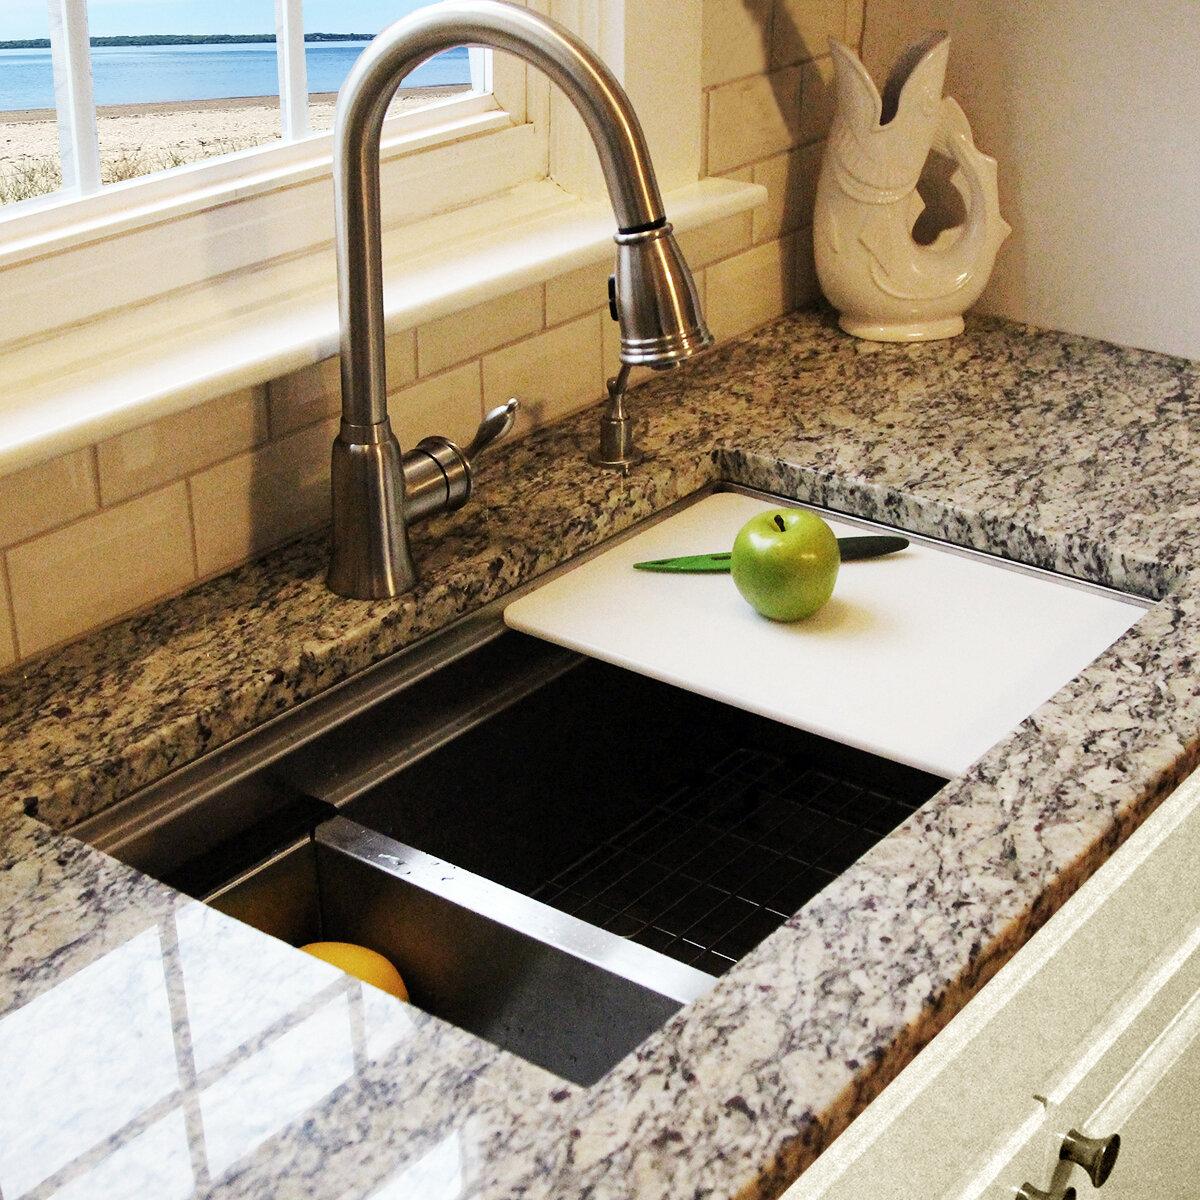 Nantucket Sinks Pro Series 30 L X 18 W Undermount Kitchen Sink Reviews Wayfair